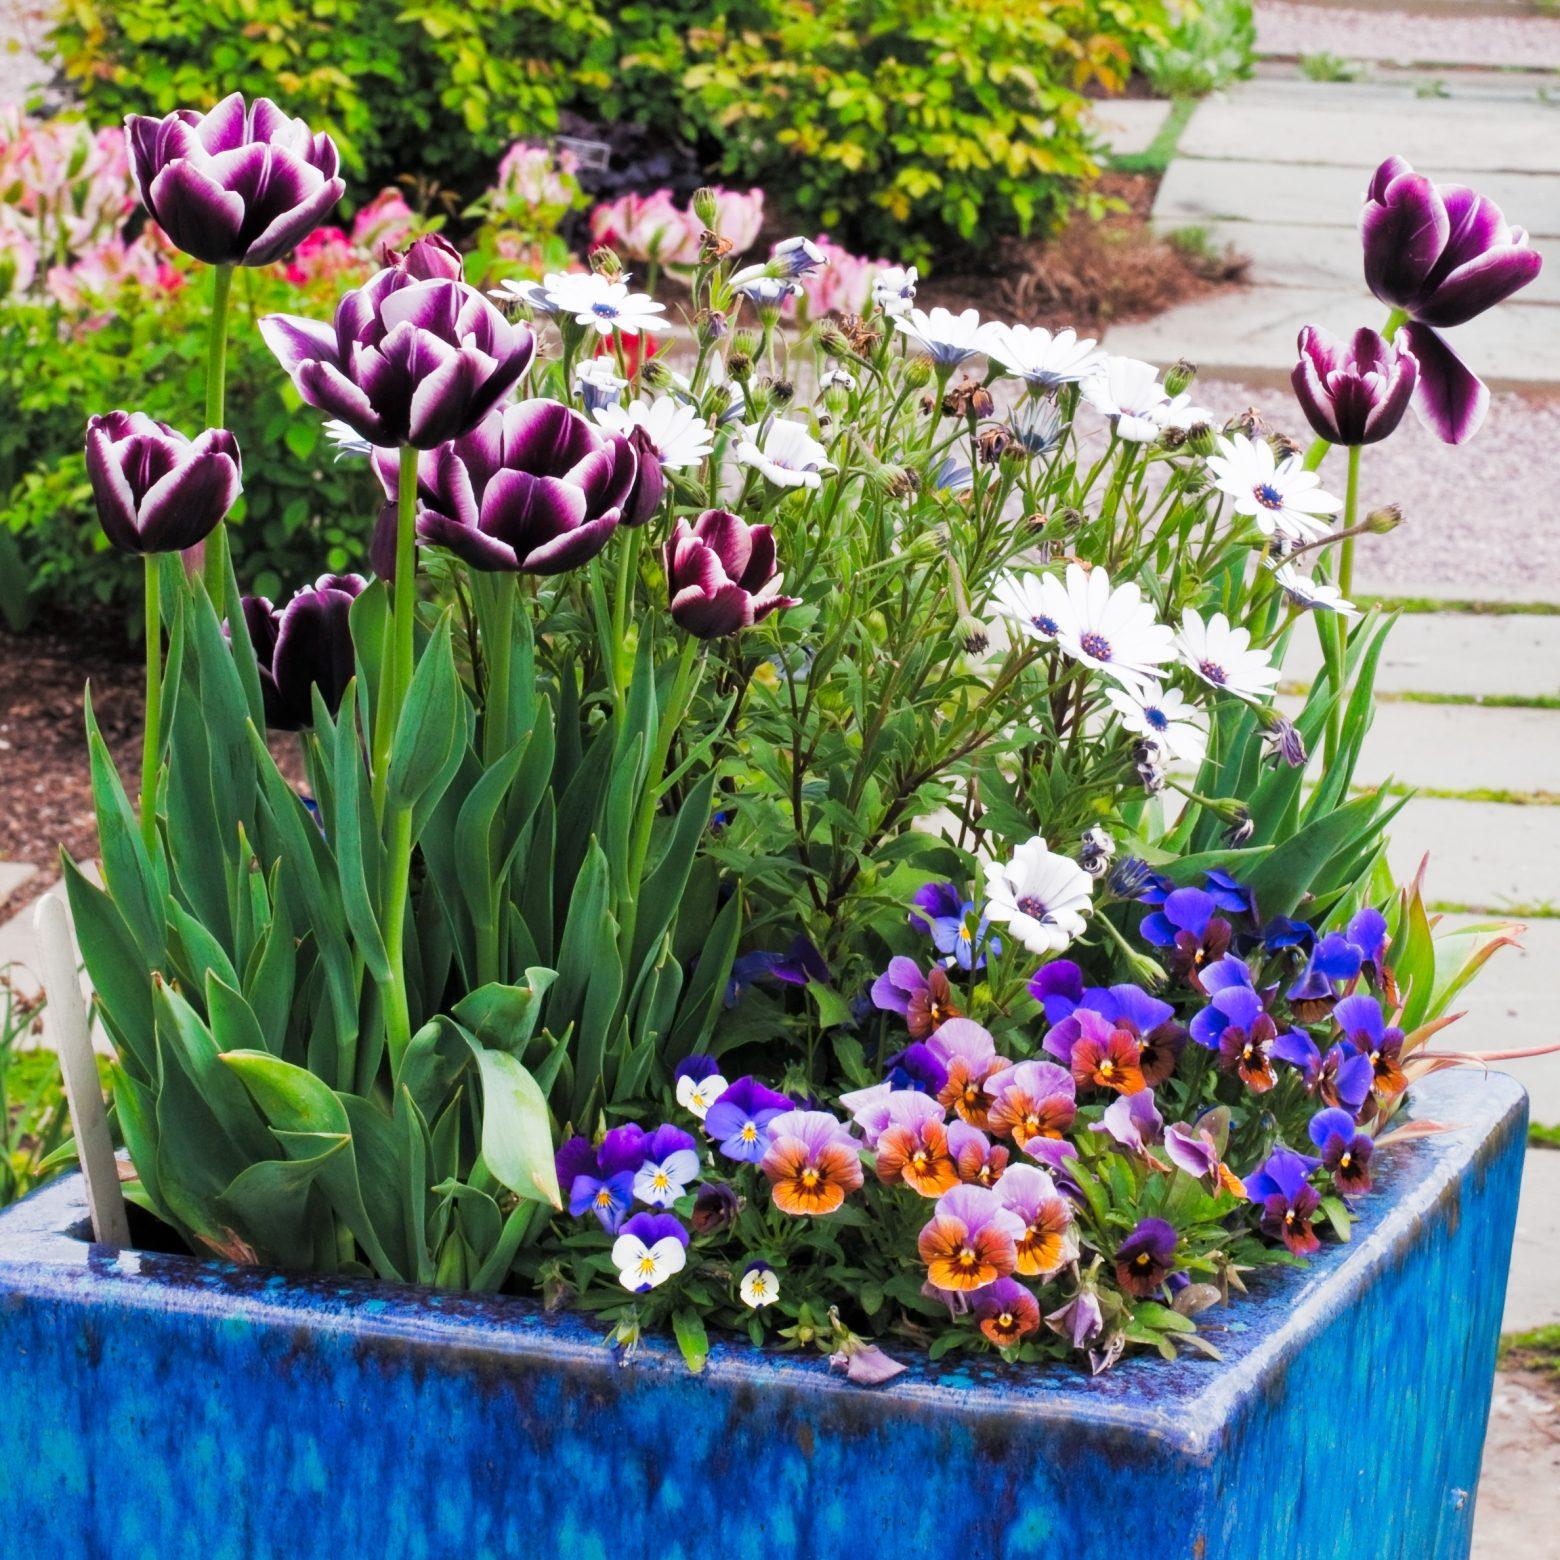 Backyard Container Gardening for Beginners